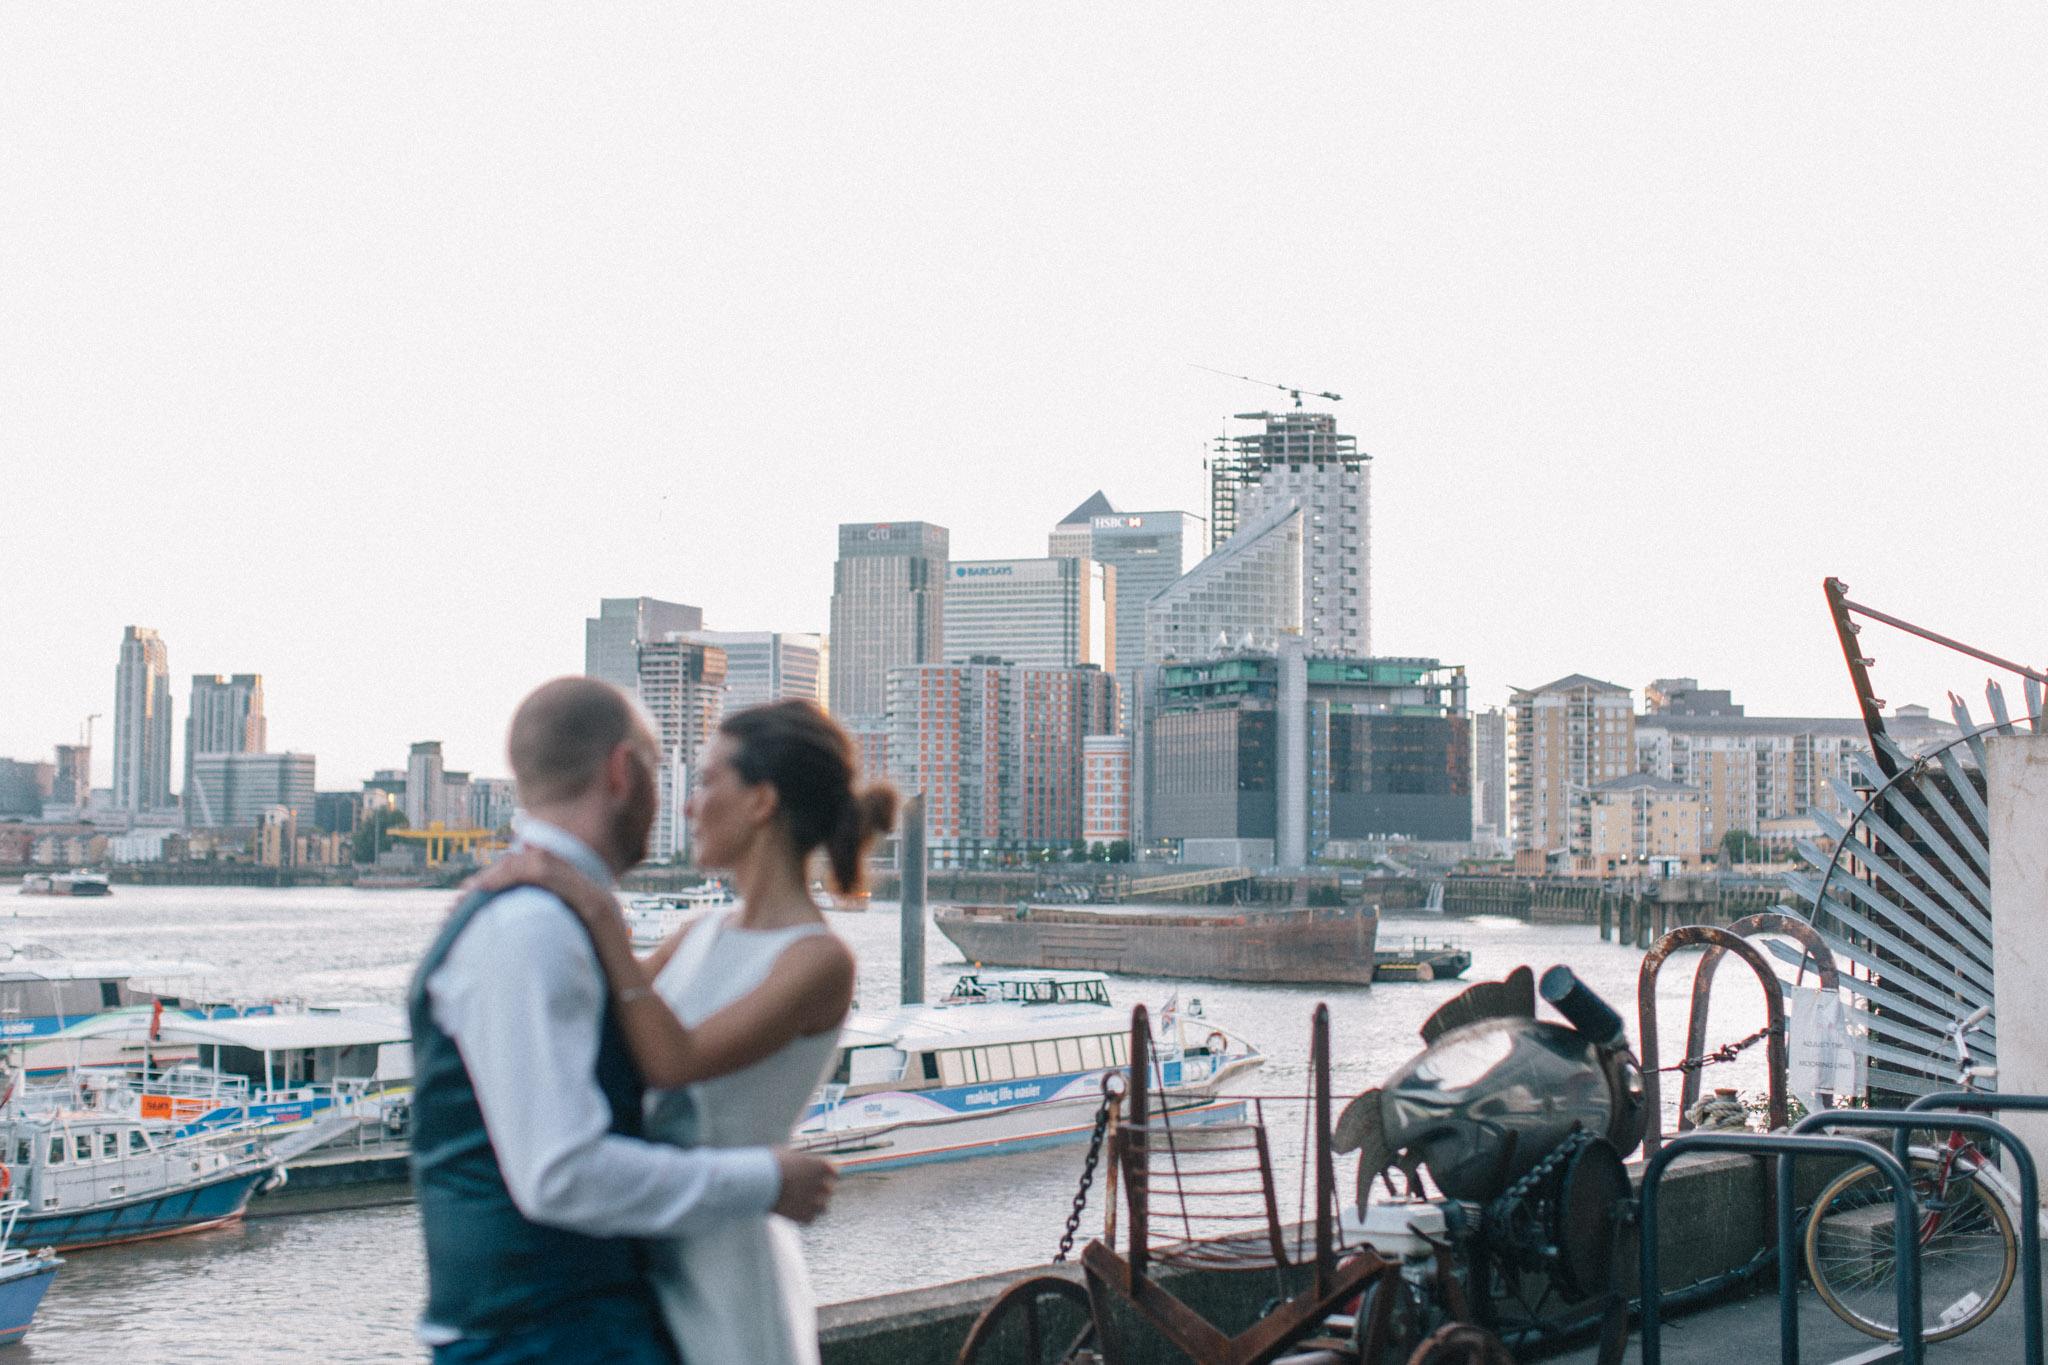 trinity_buoy_wharf_hackney_town_hall_wedding_427.jpg